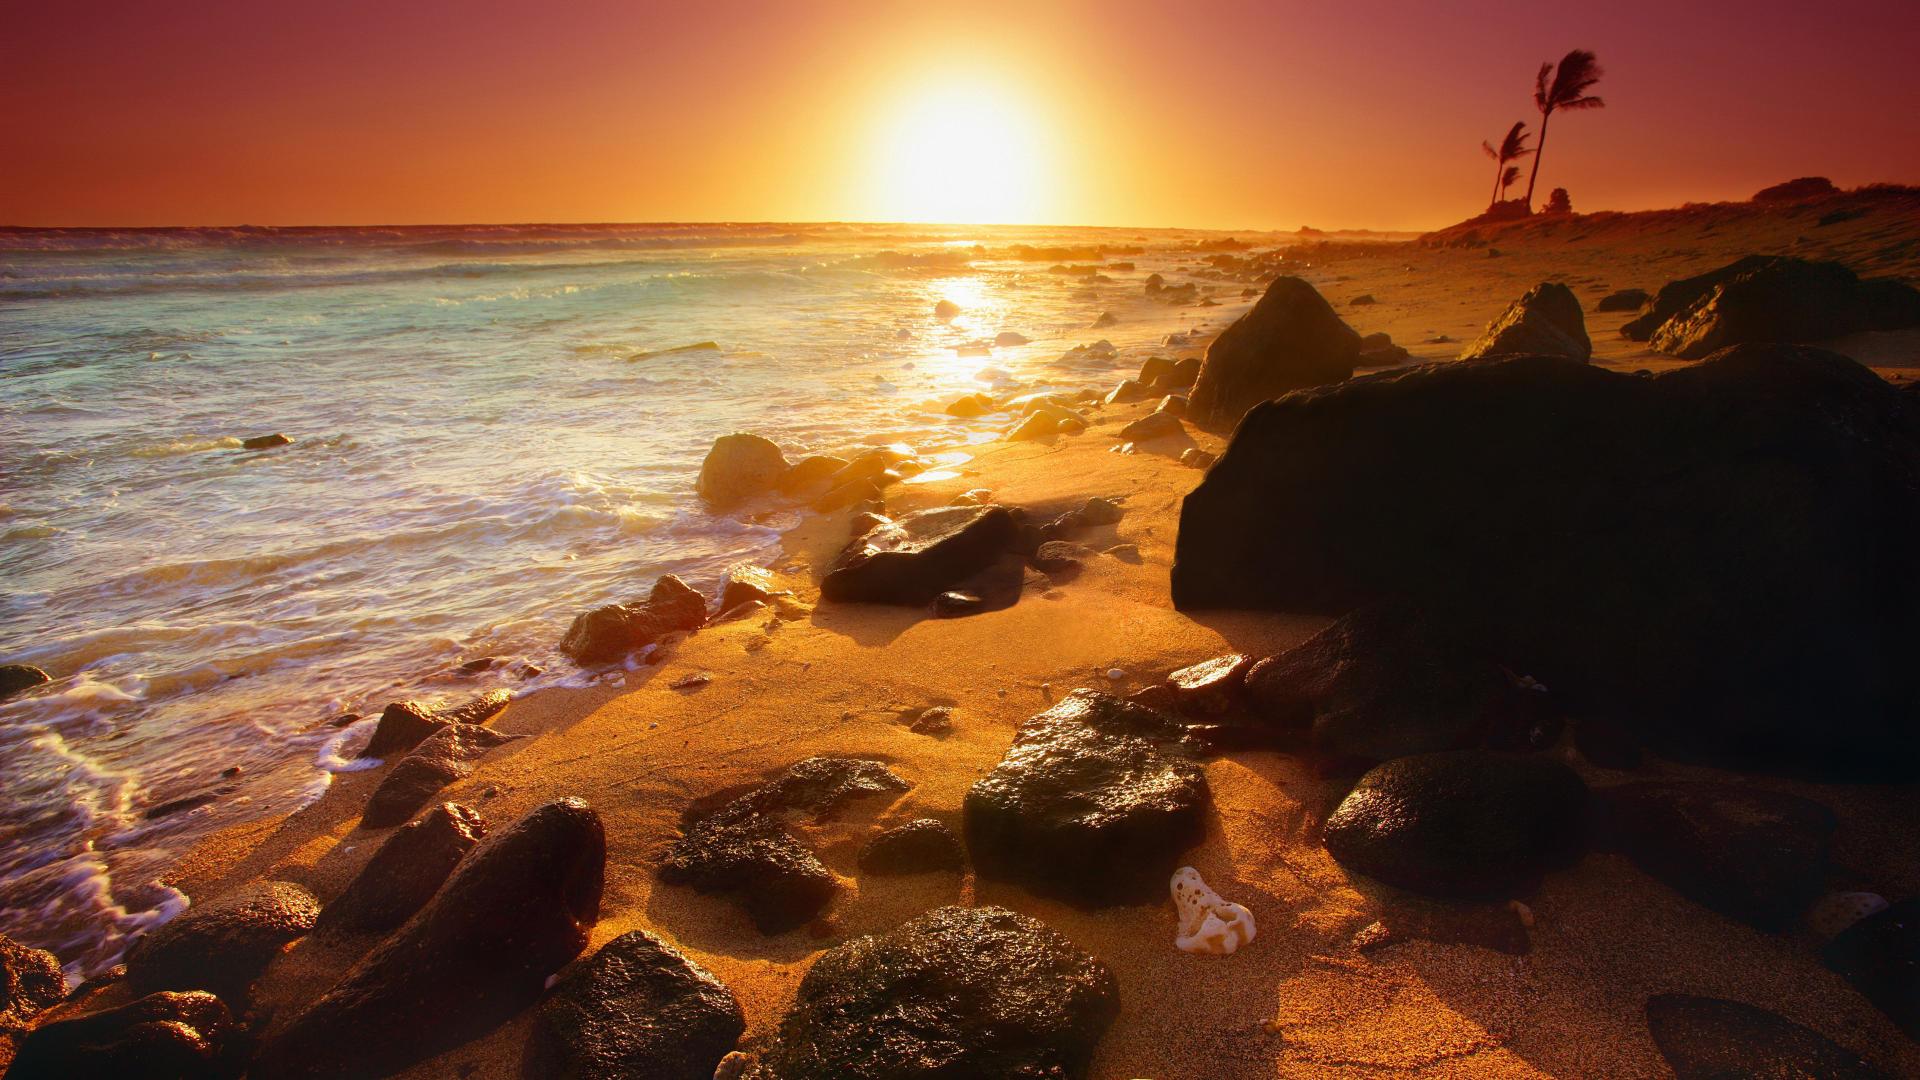 Hawaii-Sunset-Wallpapers-HD1920x1080-1024×576